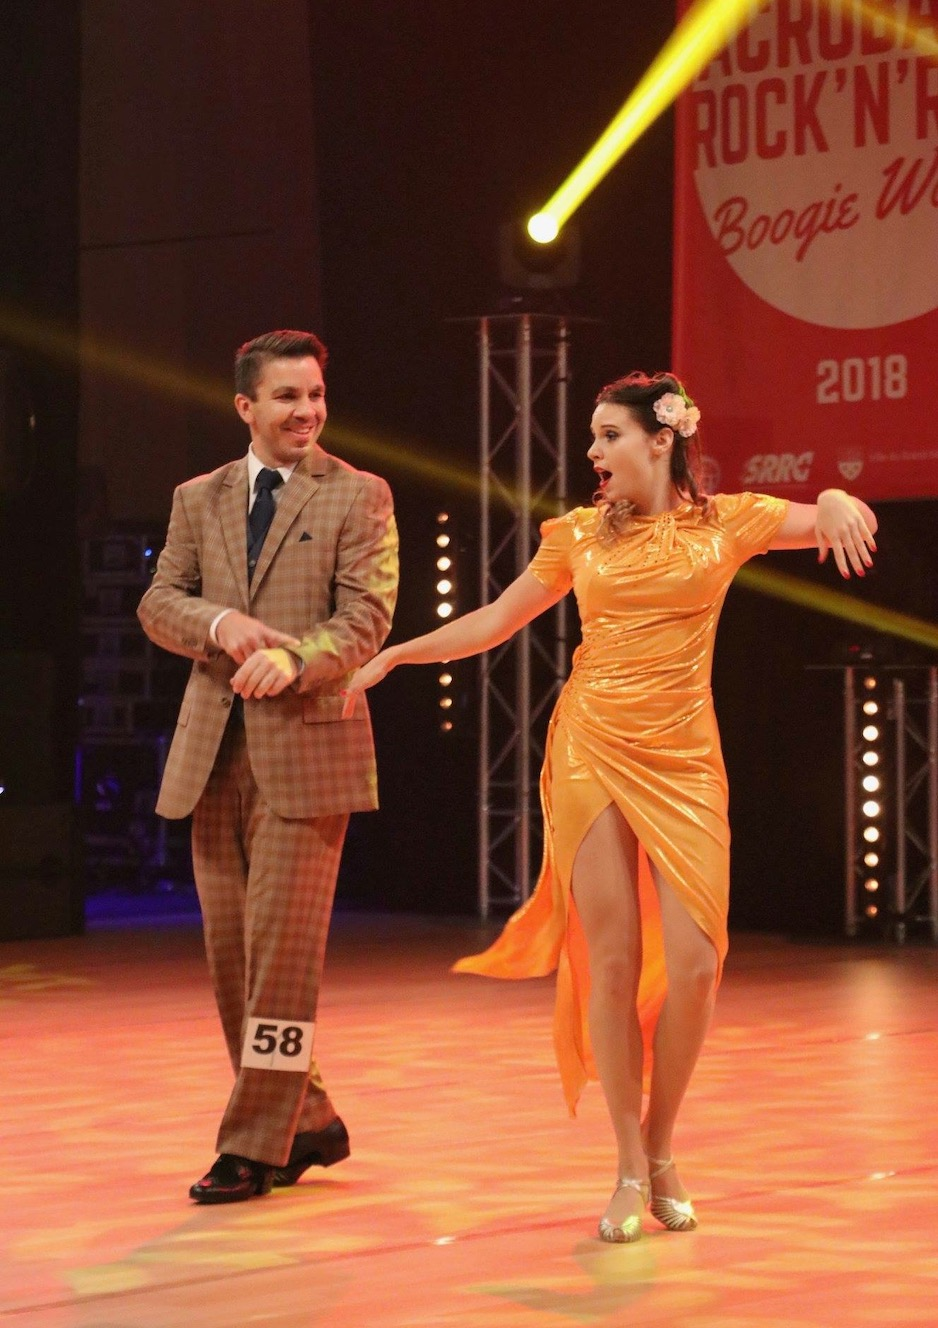 Ines Kyburz & Markus Berghahn